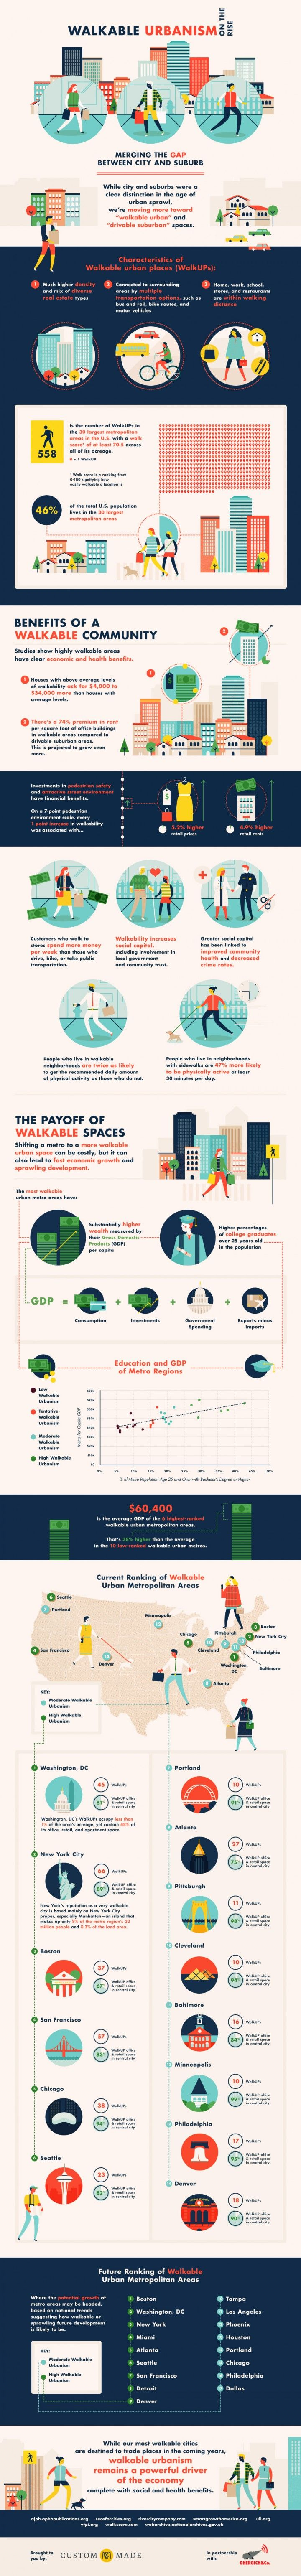 Walkable Urbanism on the Rise #walk #urban